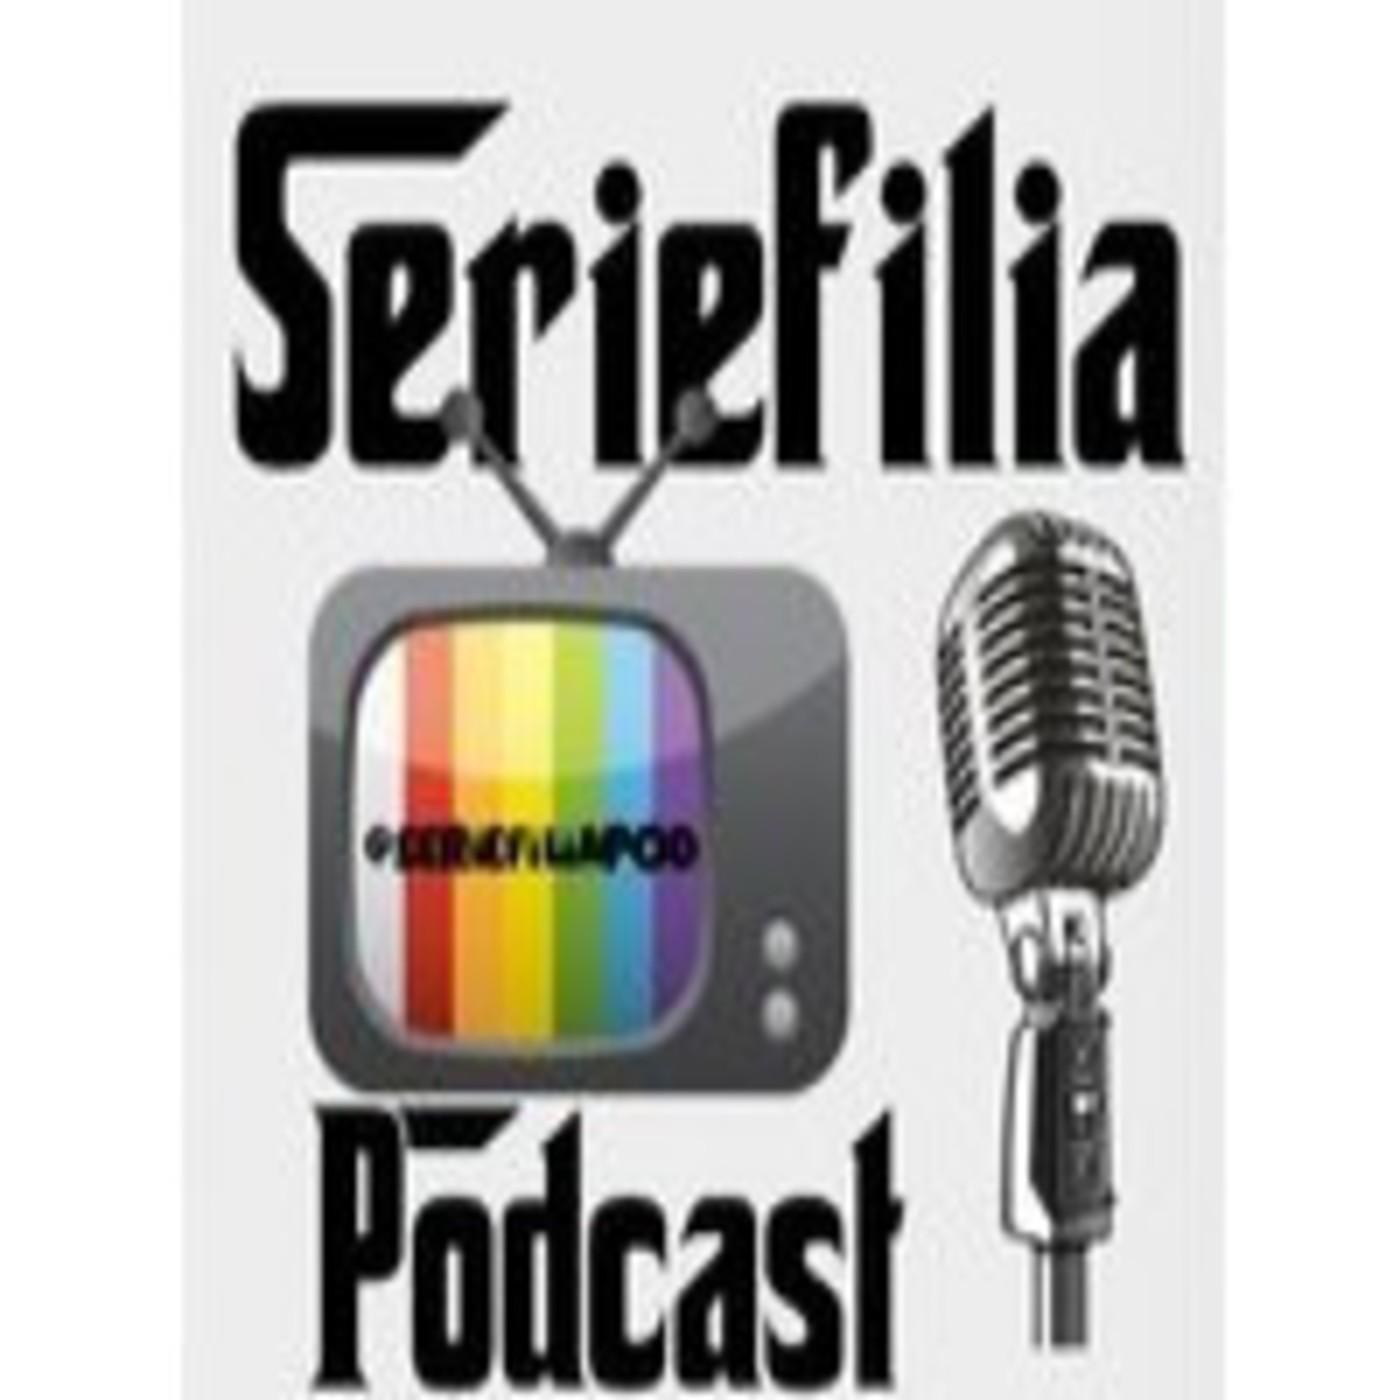 <![CDATA[Seriefilia Podcast]]>